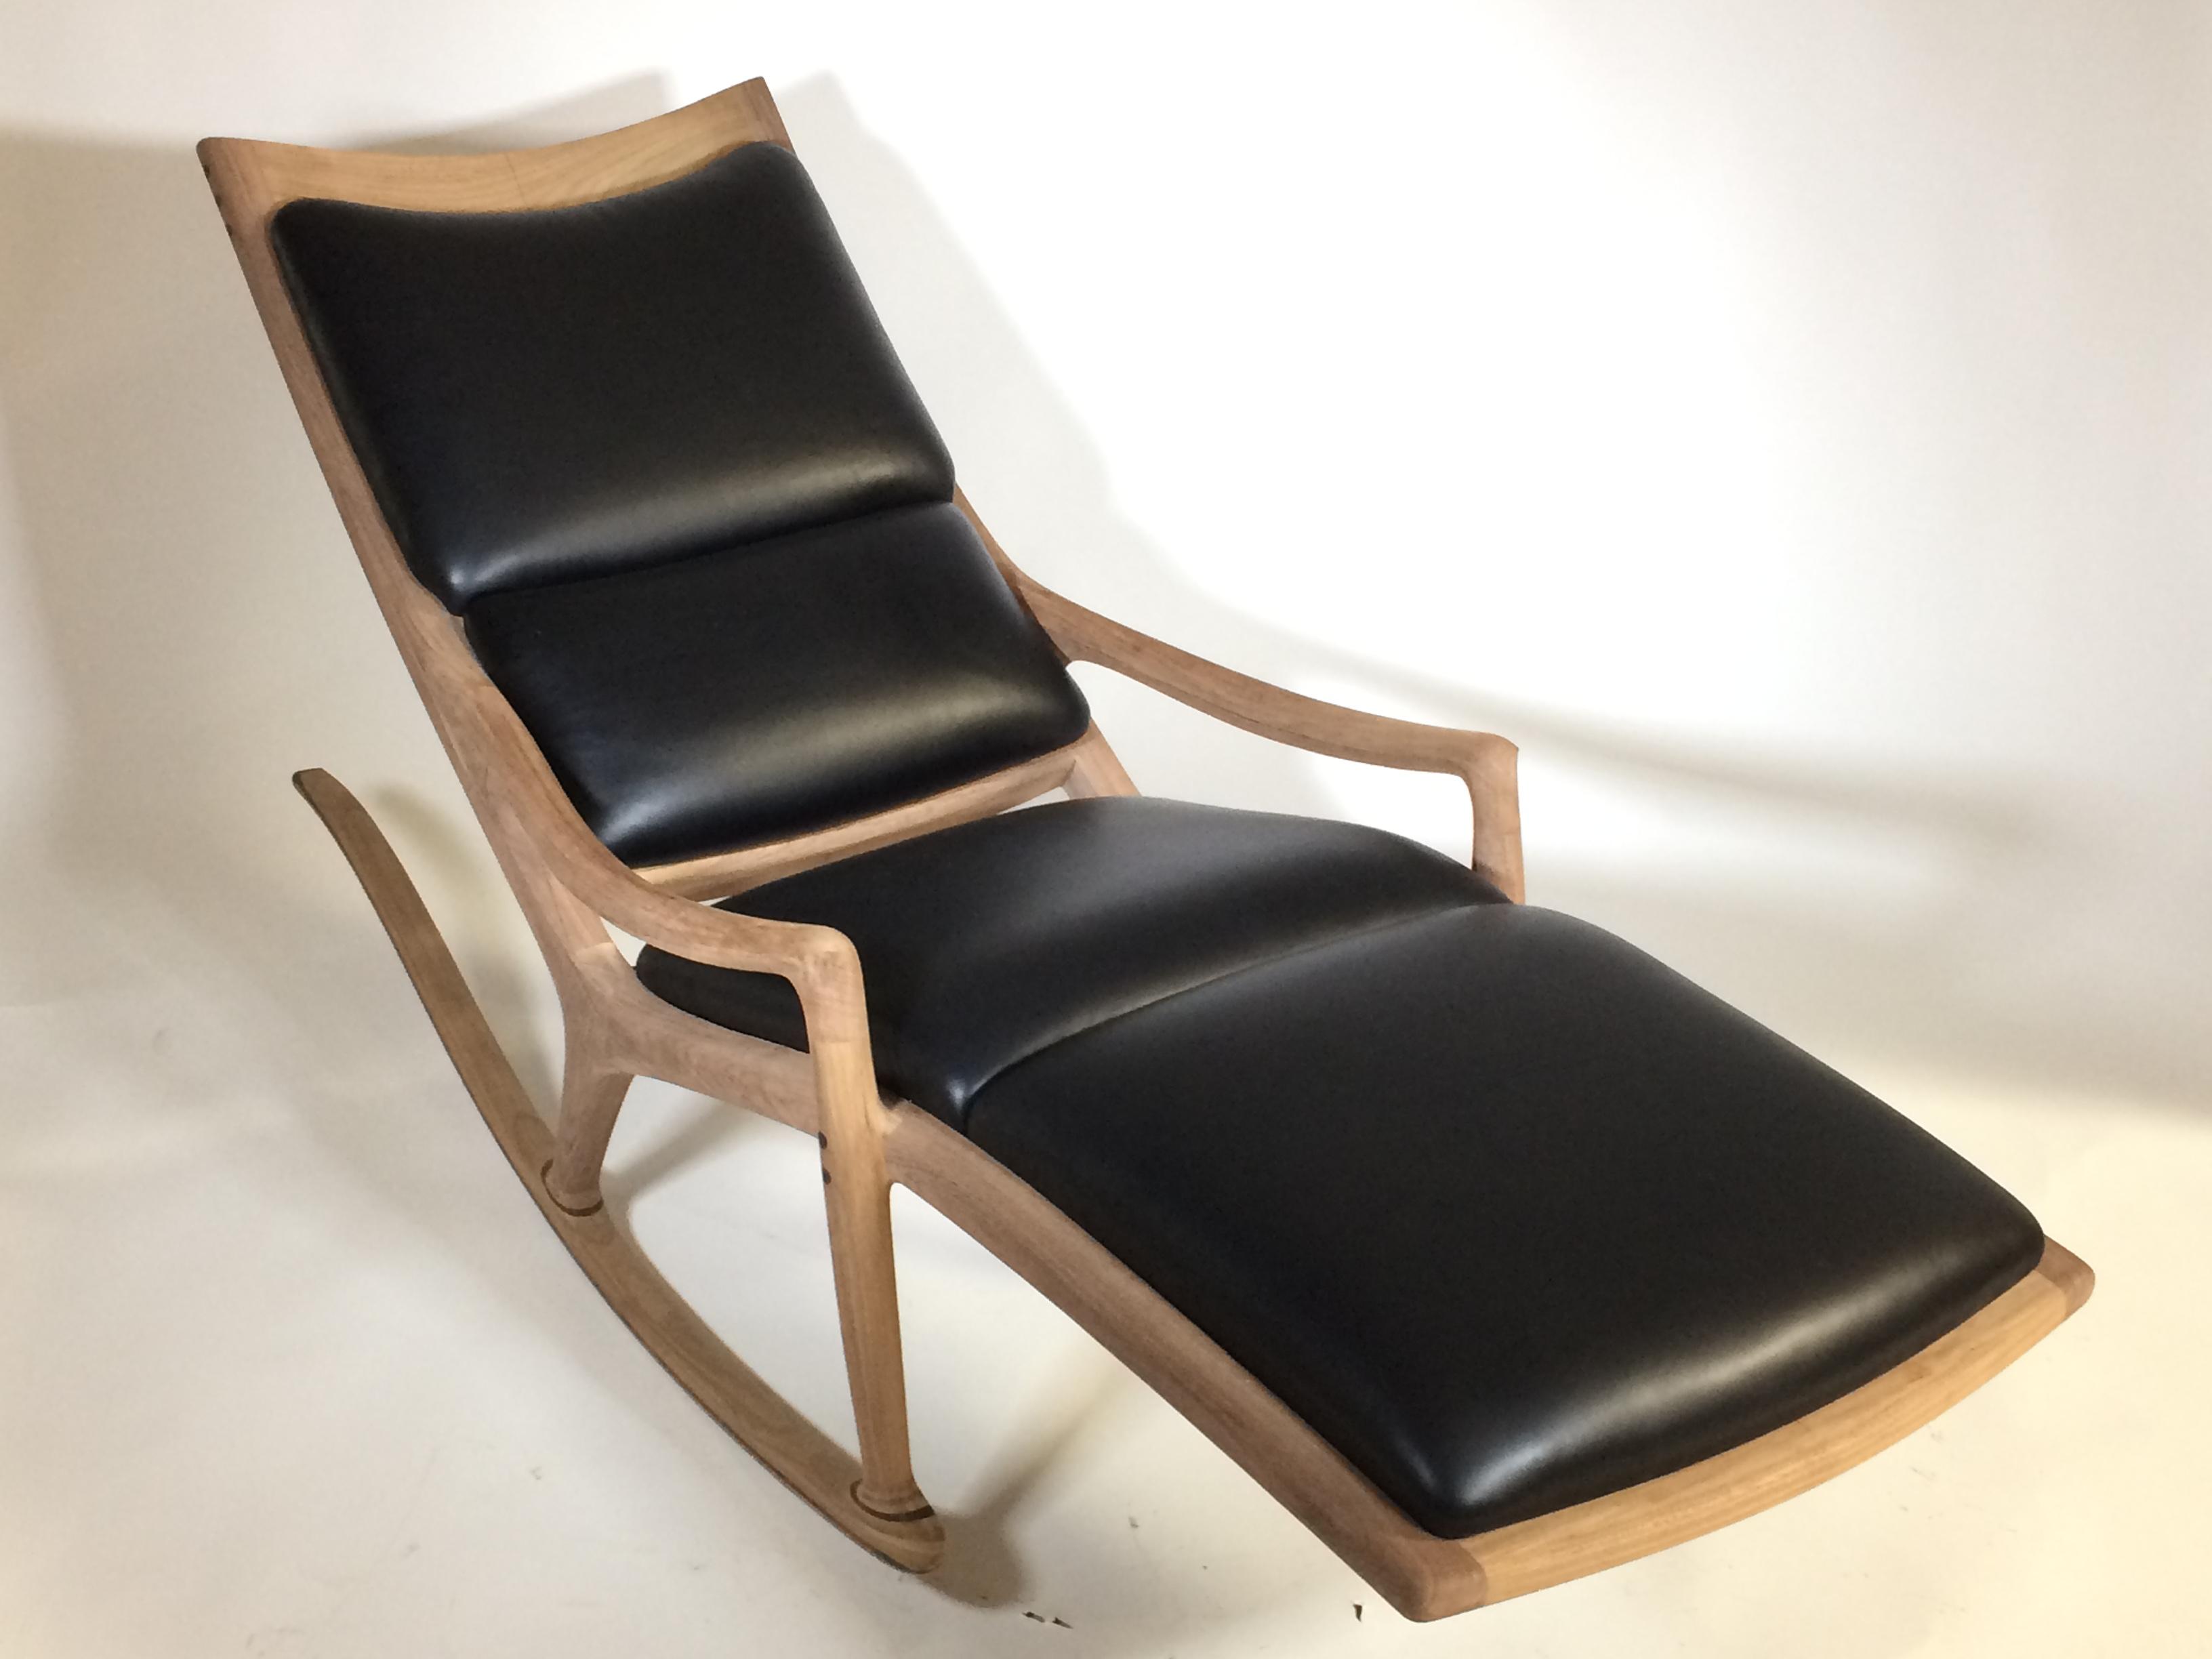 sam-maloof-chaise-lounge-rocking-chair-2